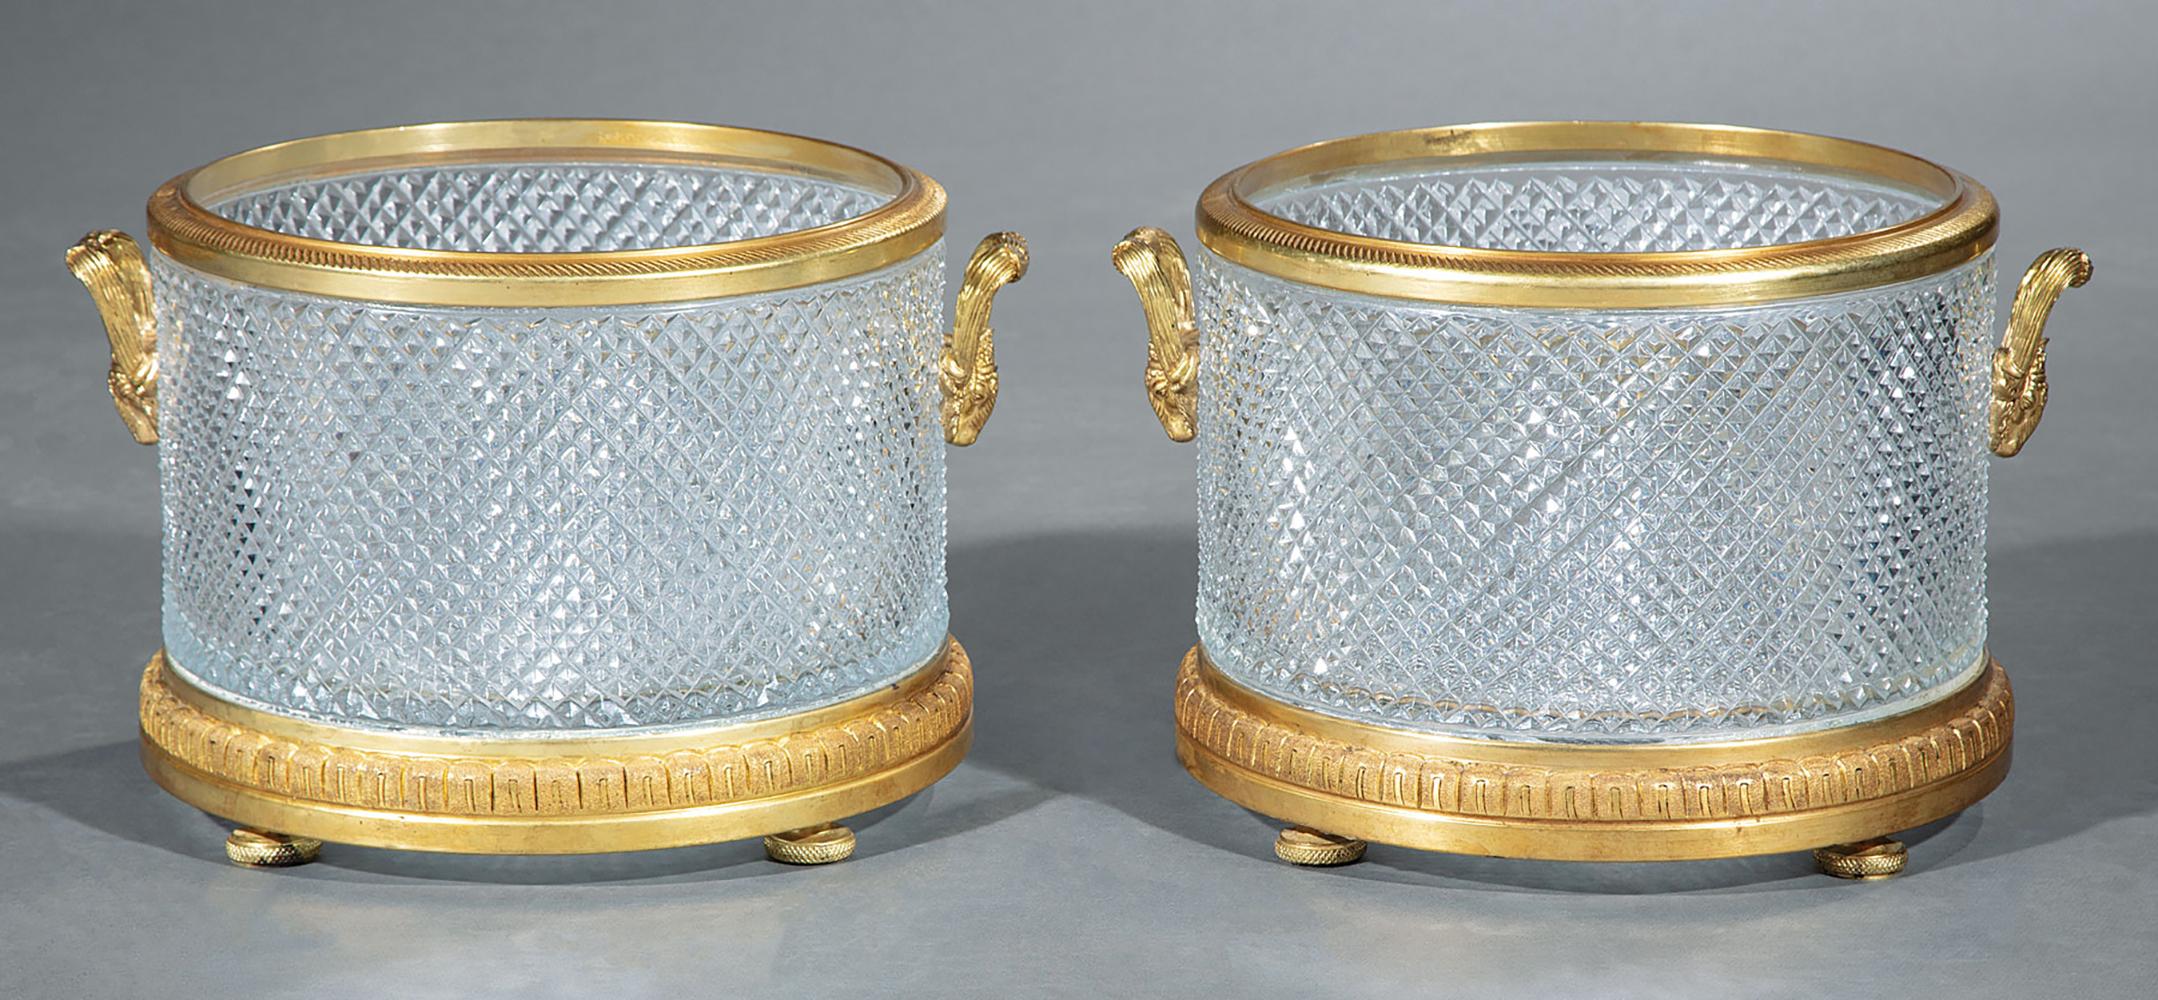 Lot 29 - Pair of Bronze-Mounted Baccarat-Style Diamond Point Cut Crystal Jardinieres , ram's head handles, h.